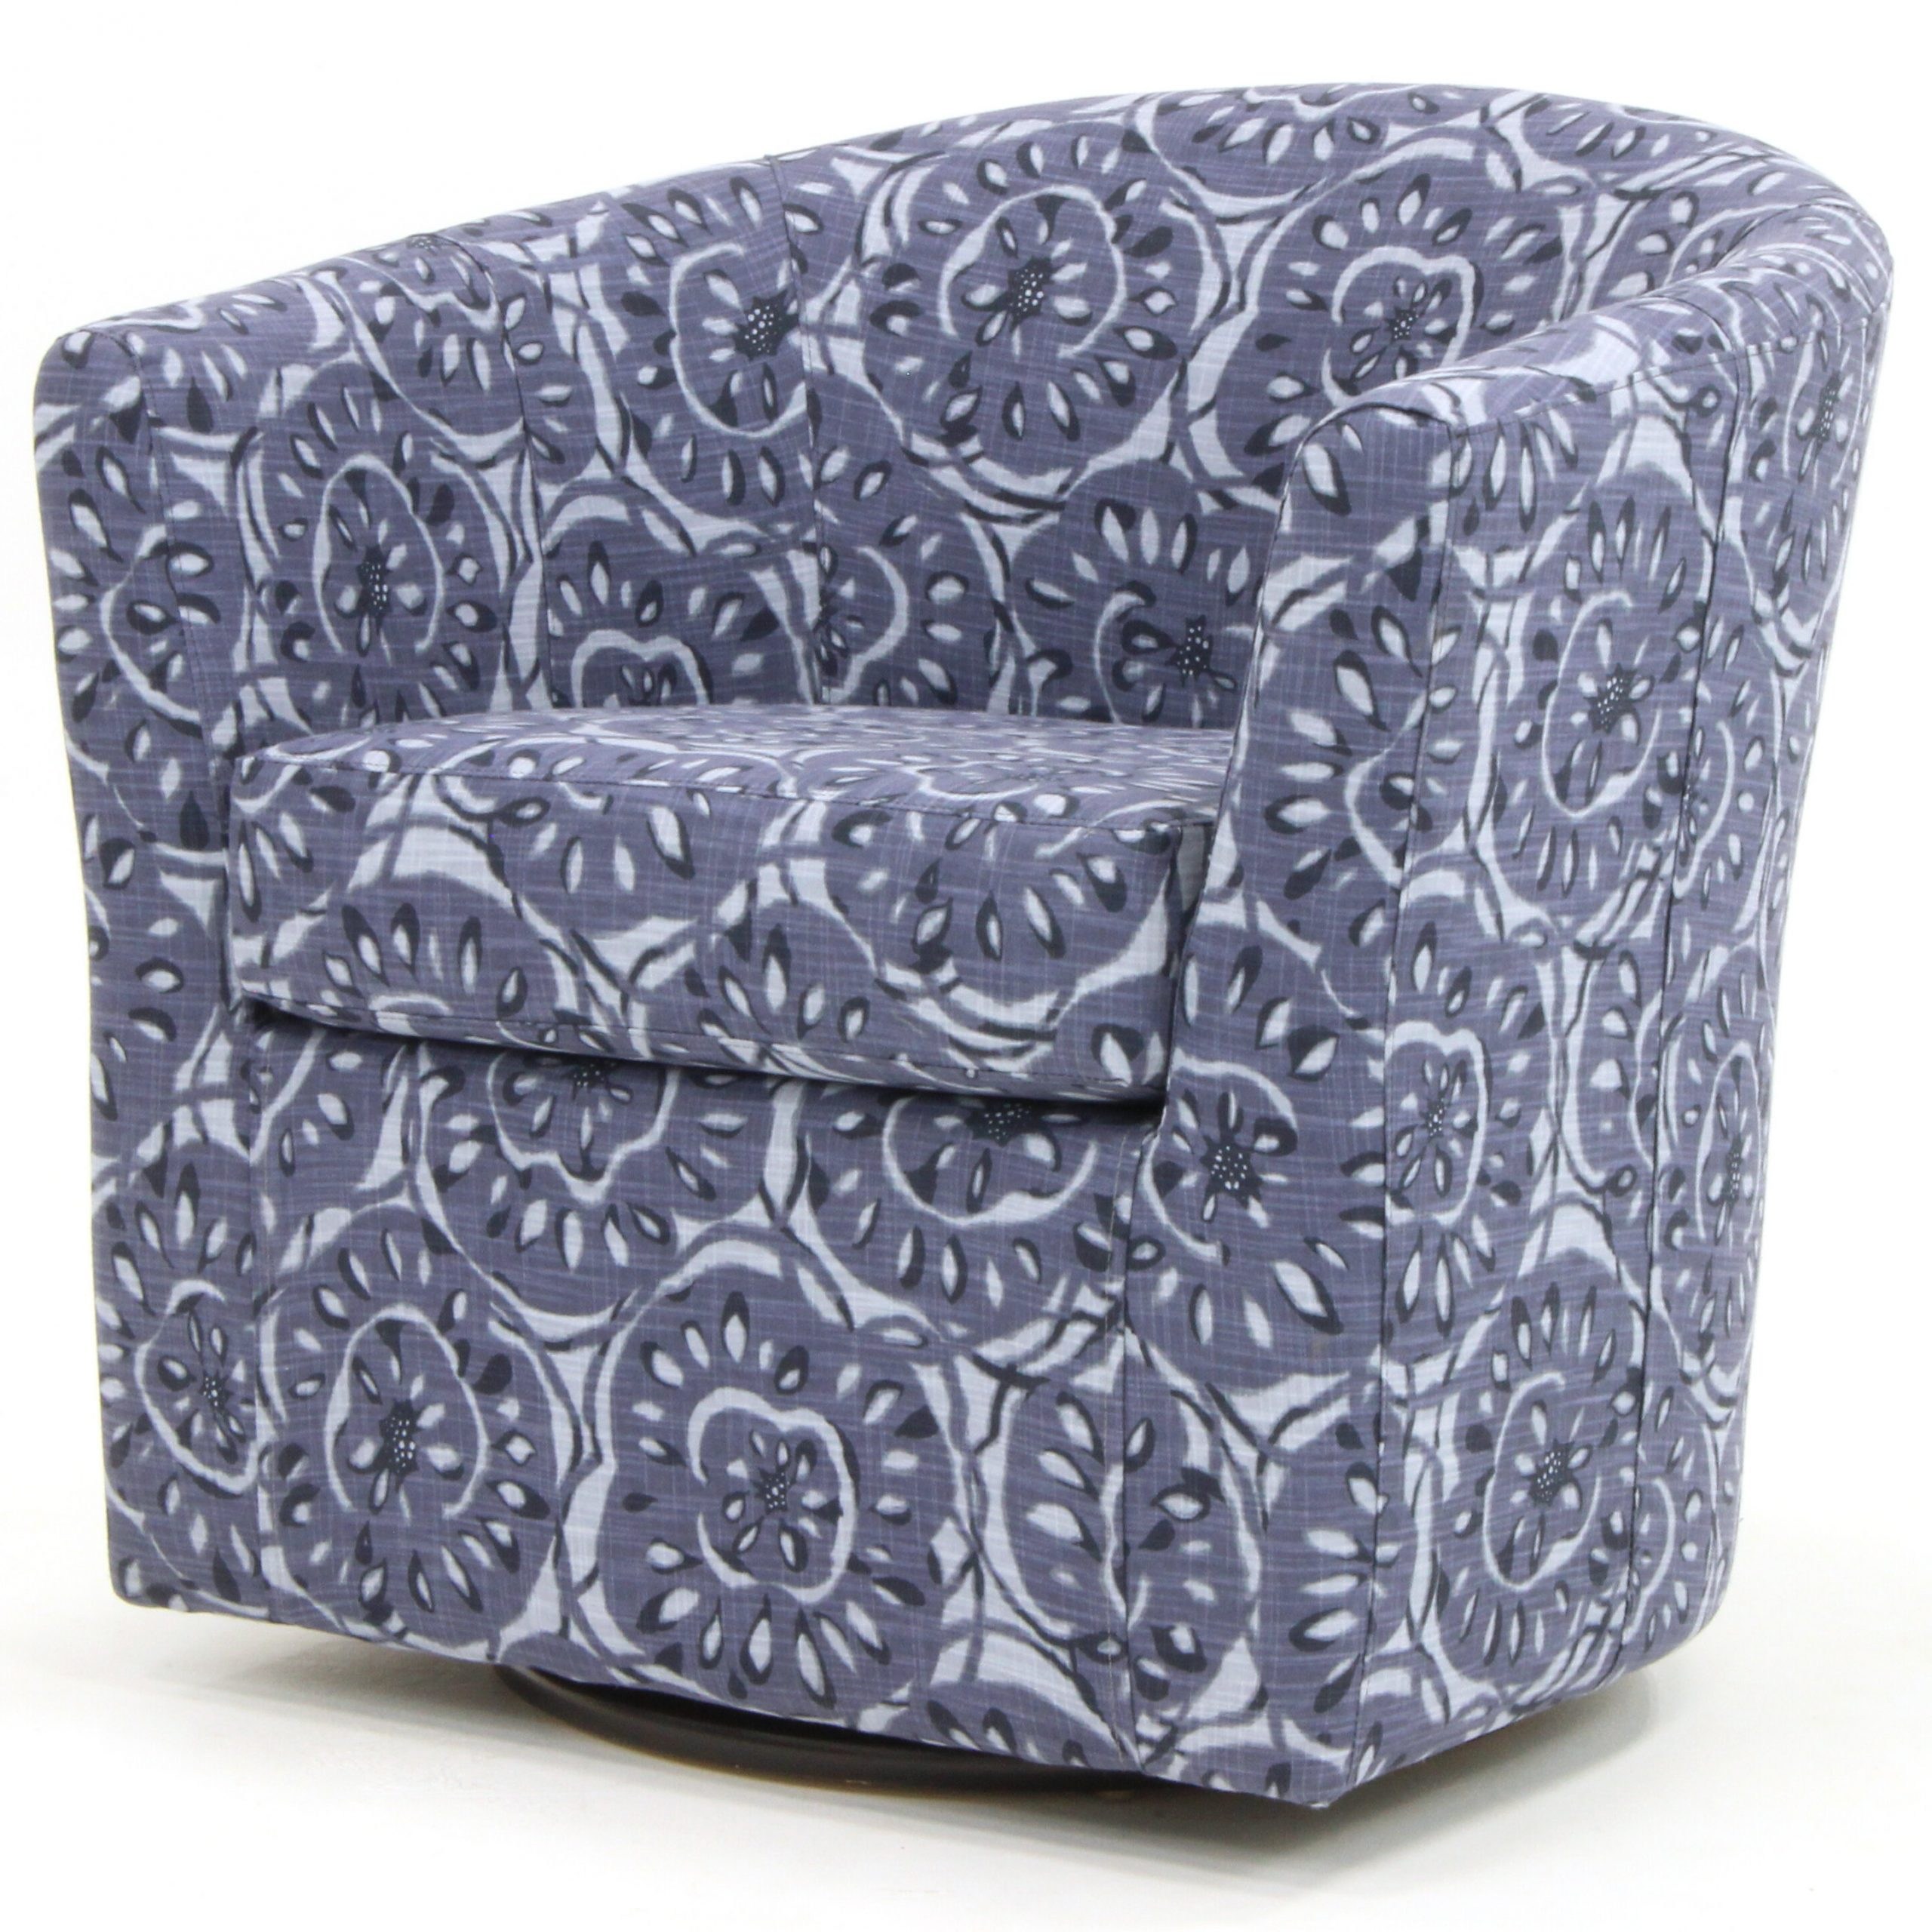 Most Current Molinari Swivel Barrel Chair For Molinari Swivel Barrel Chairs (View 4 of 20)